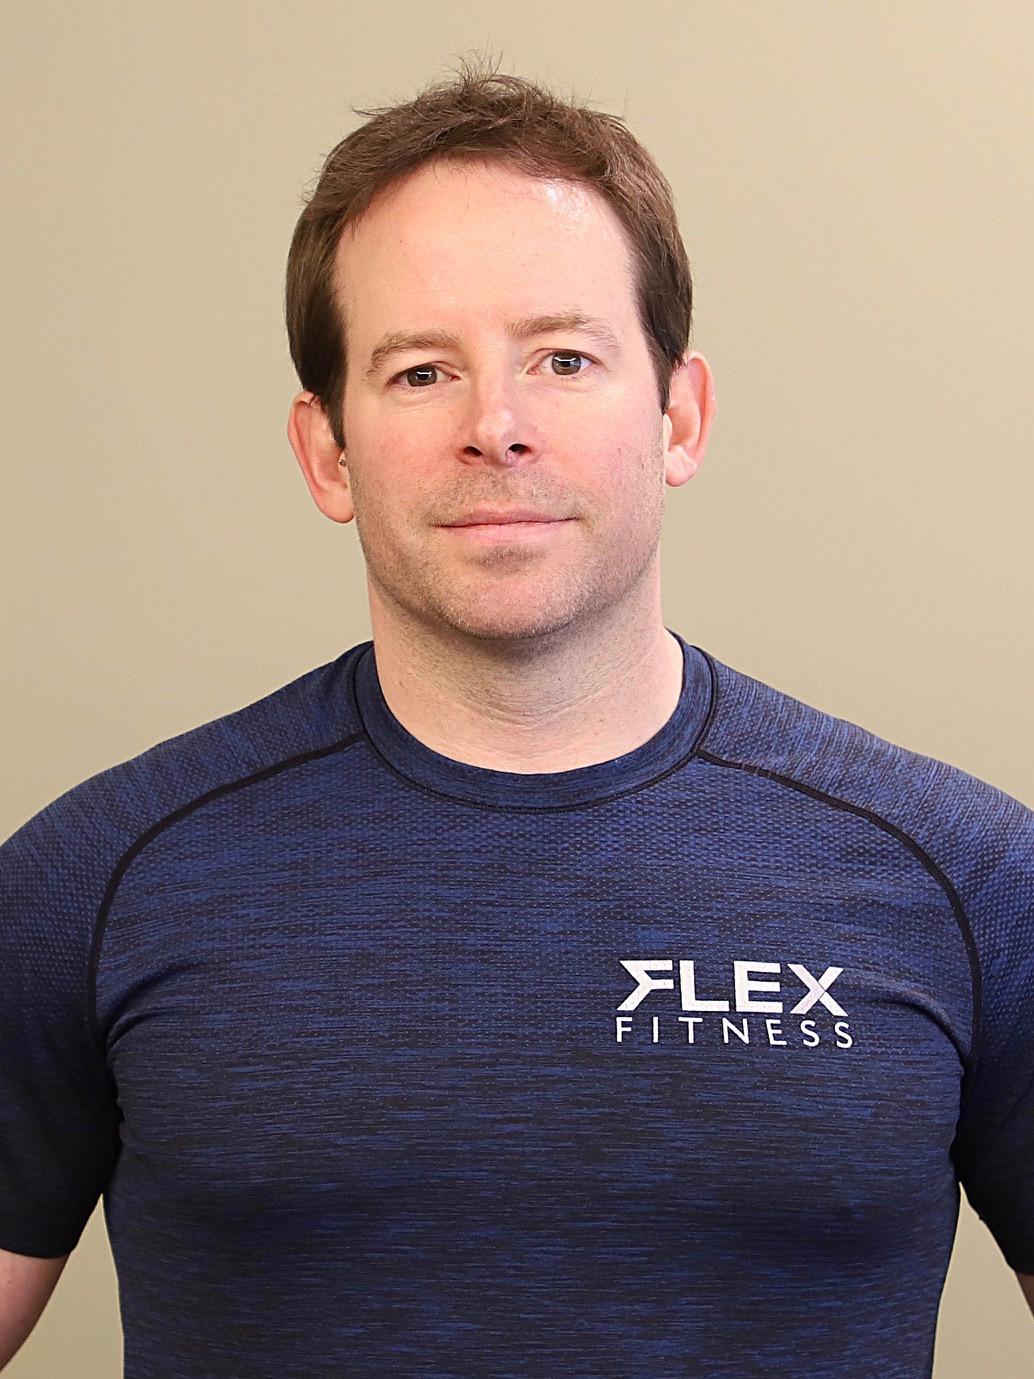 Flex Fitness Winnipeg Alistair Profile.jpg